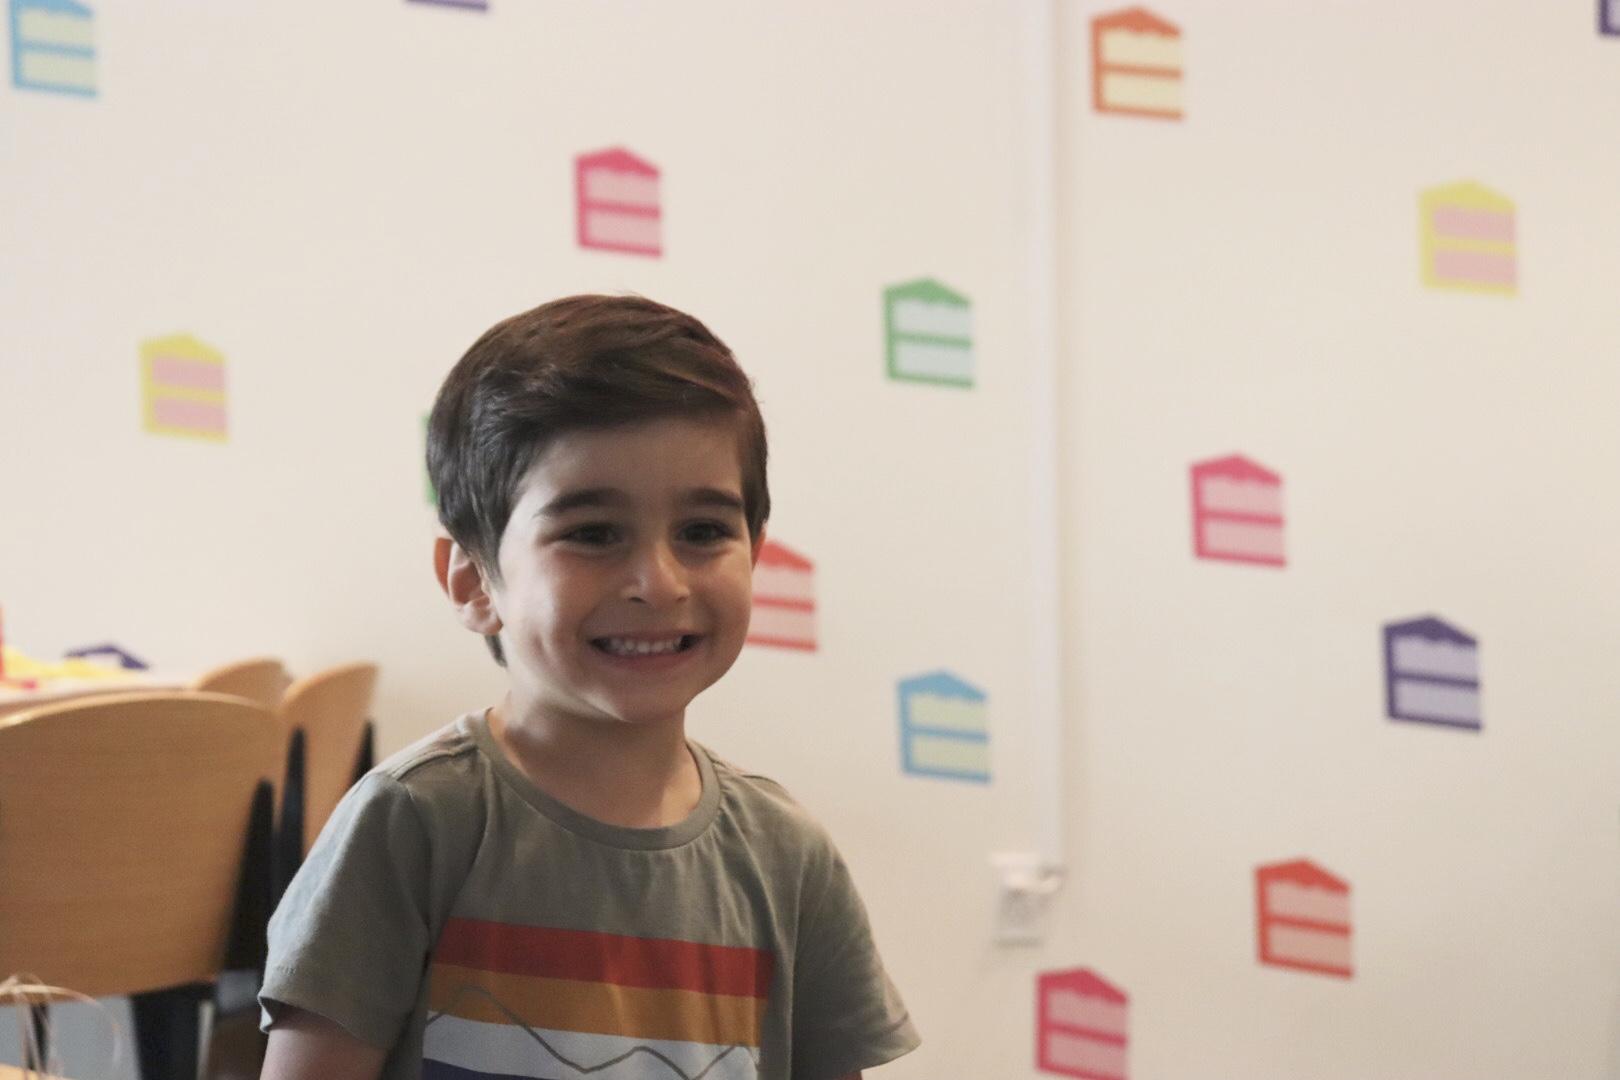 El Abad's oldest son, Ryan, smiling. Land of Mom.